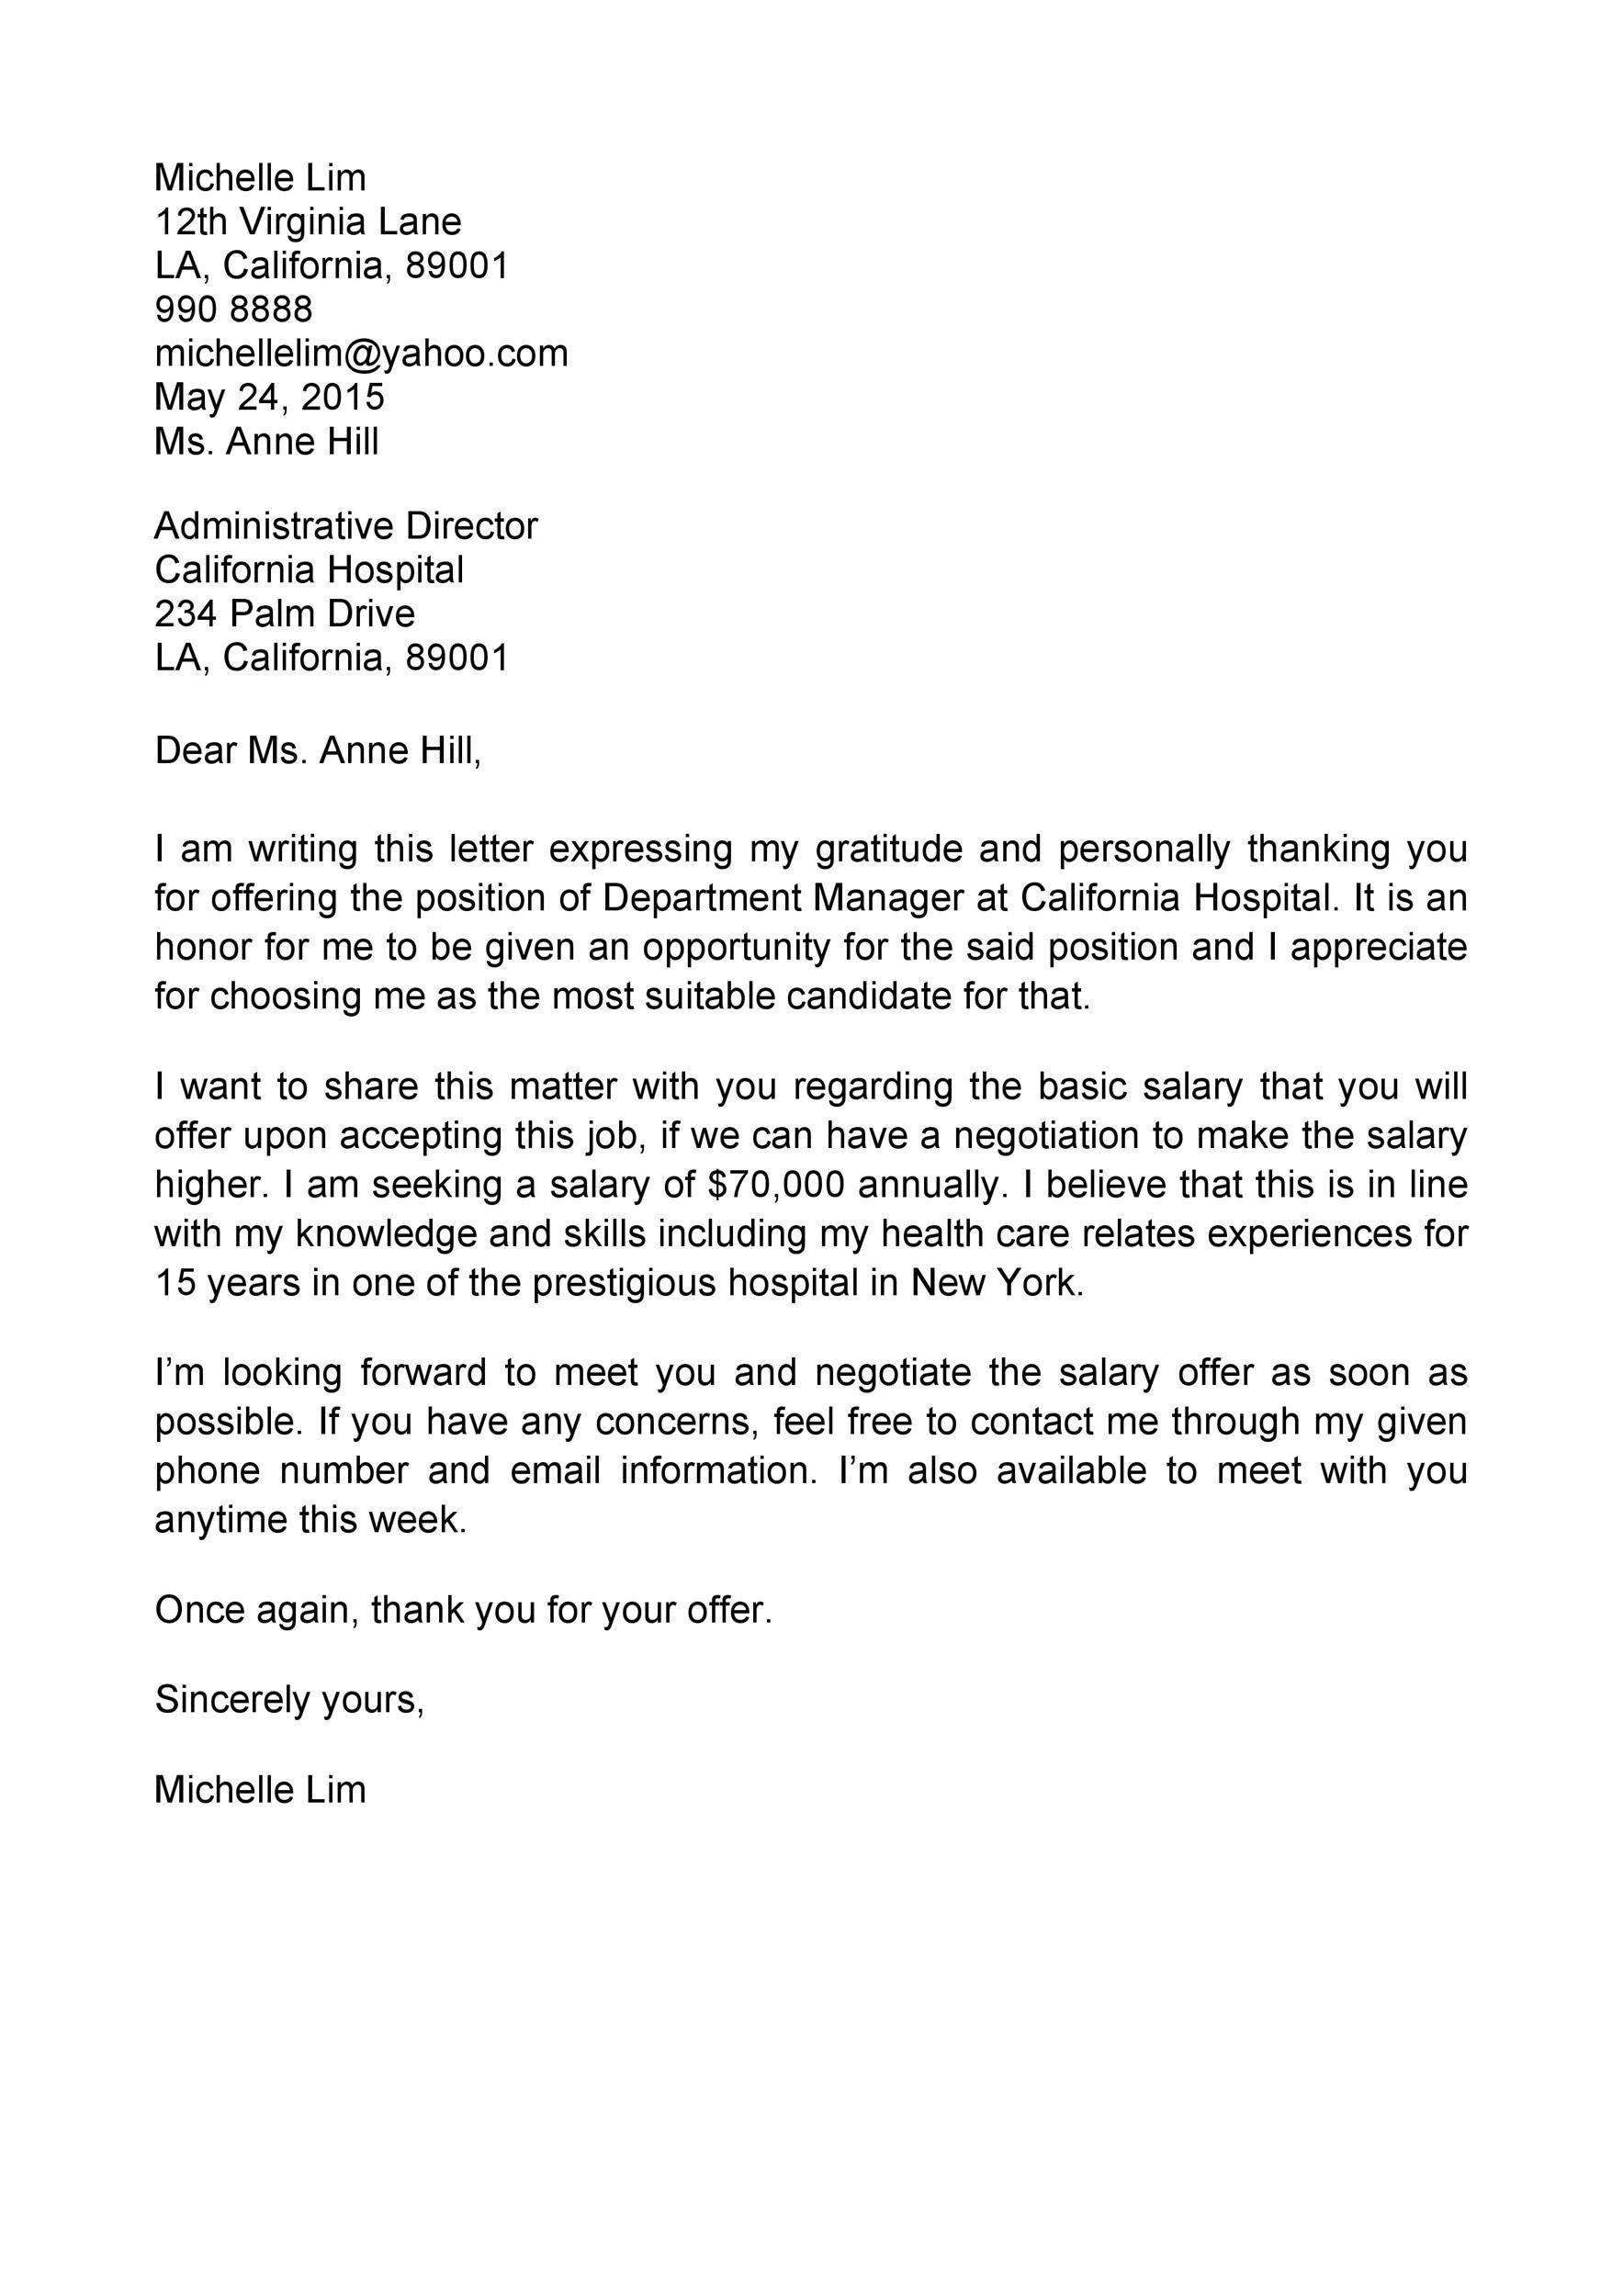 Job Offer Negotiation Letter Sample in 2020 Letter